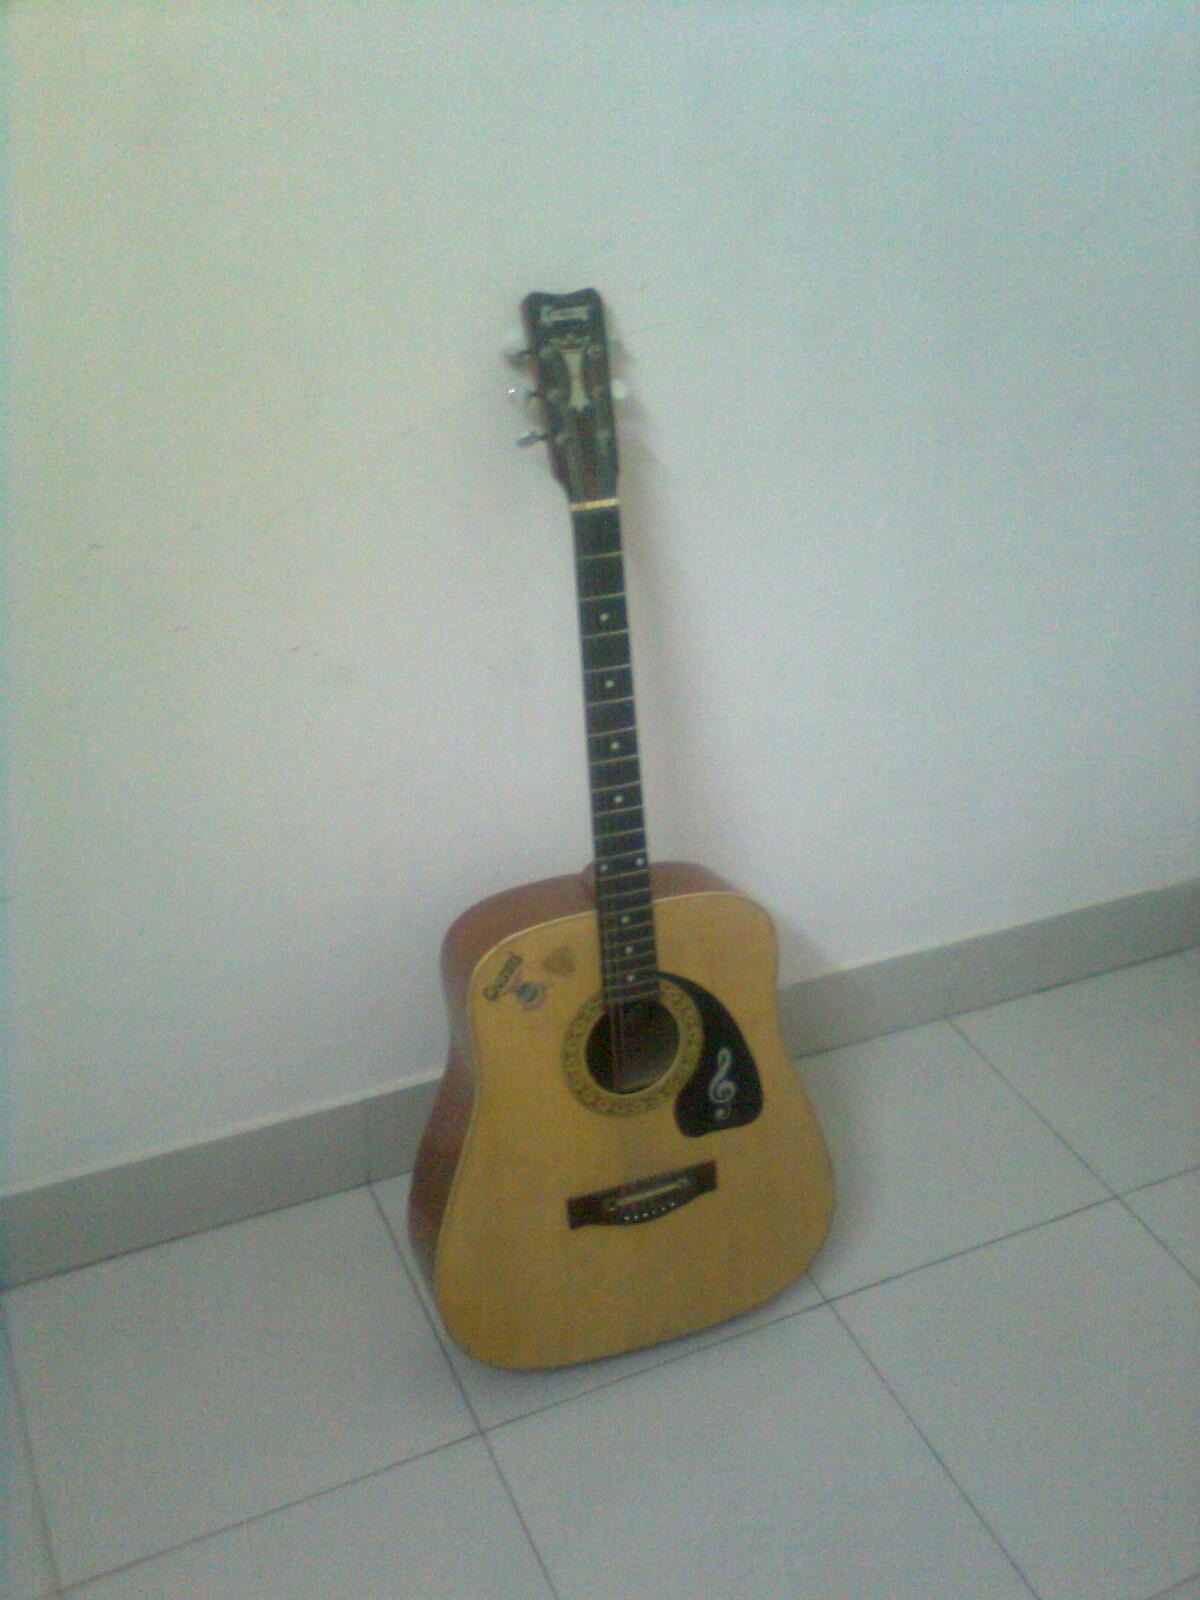 givson jumbo acoustic guitar clickbd. Black Bedroom Furniture Sets. Home Design Ideas